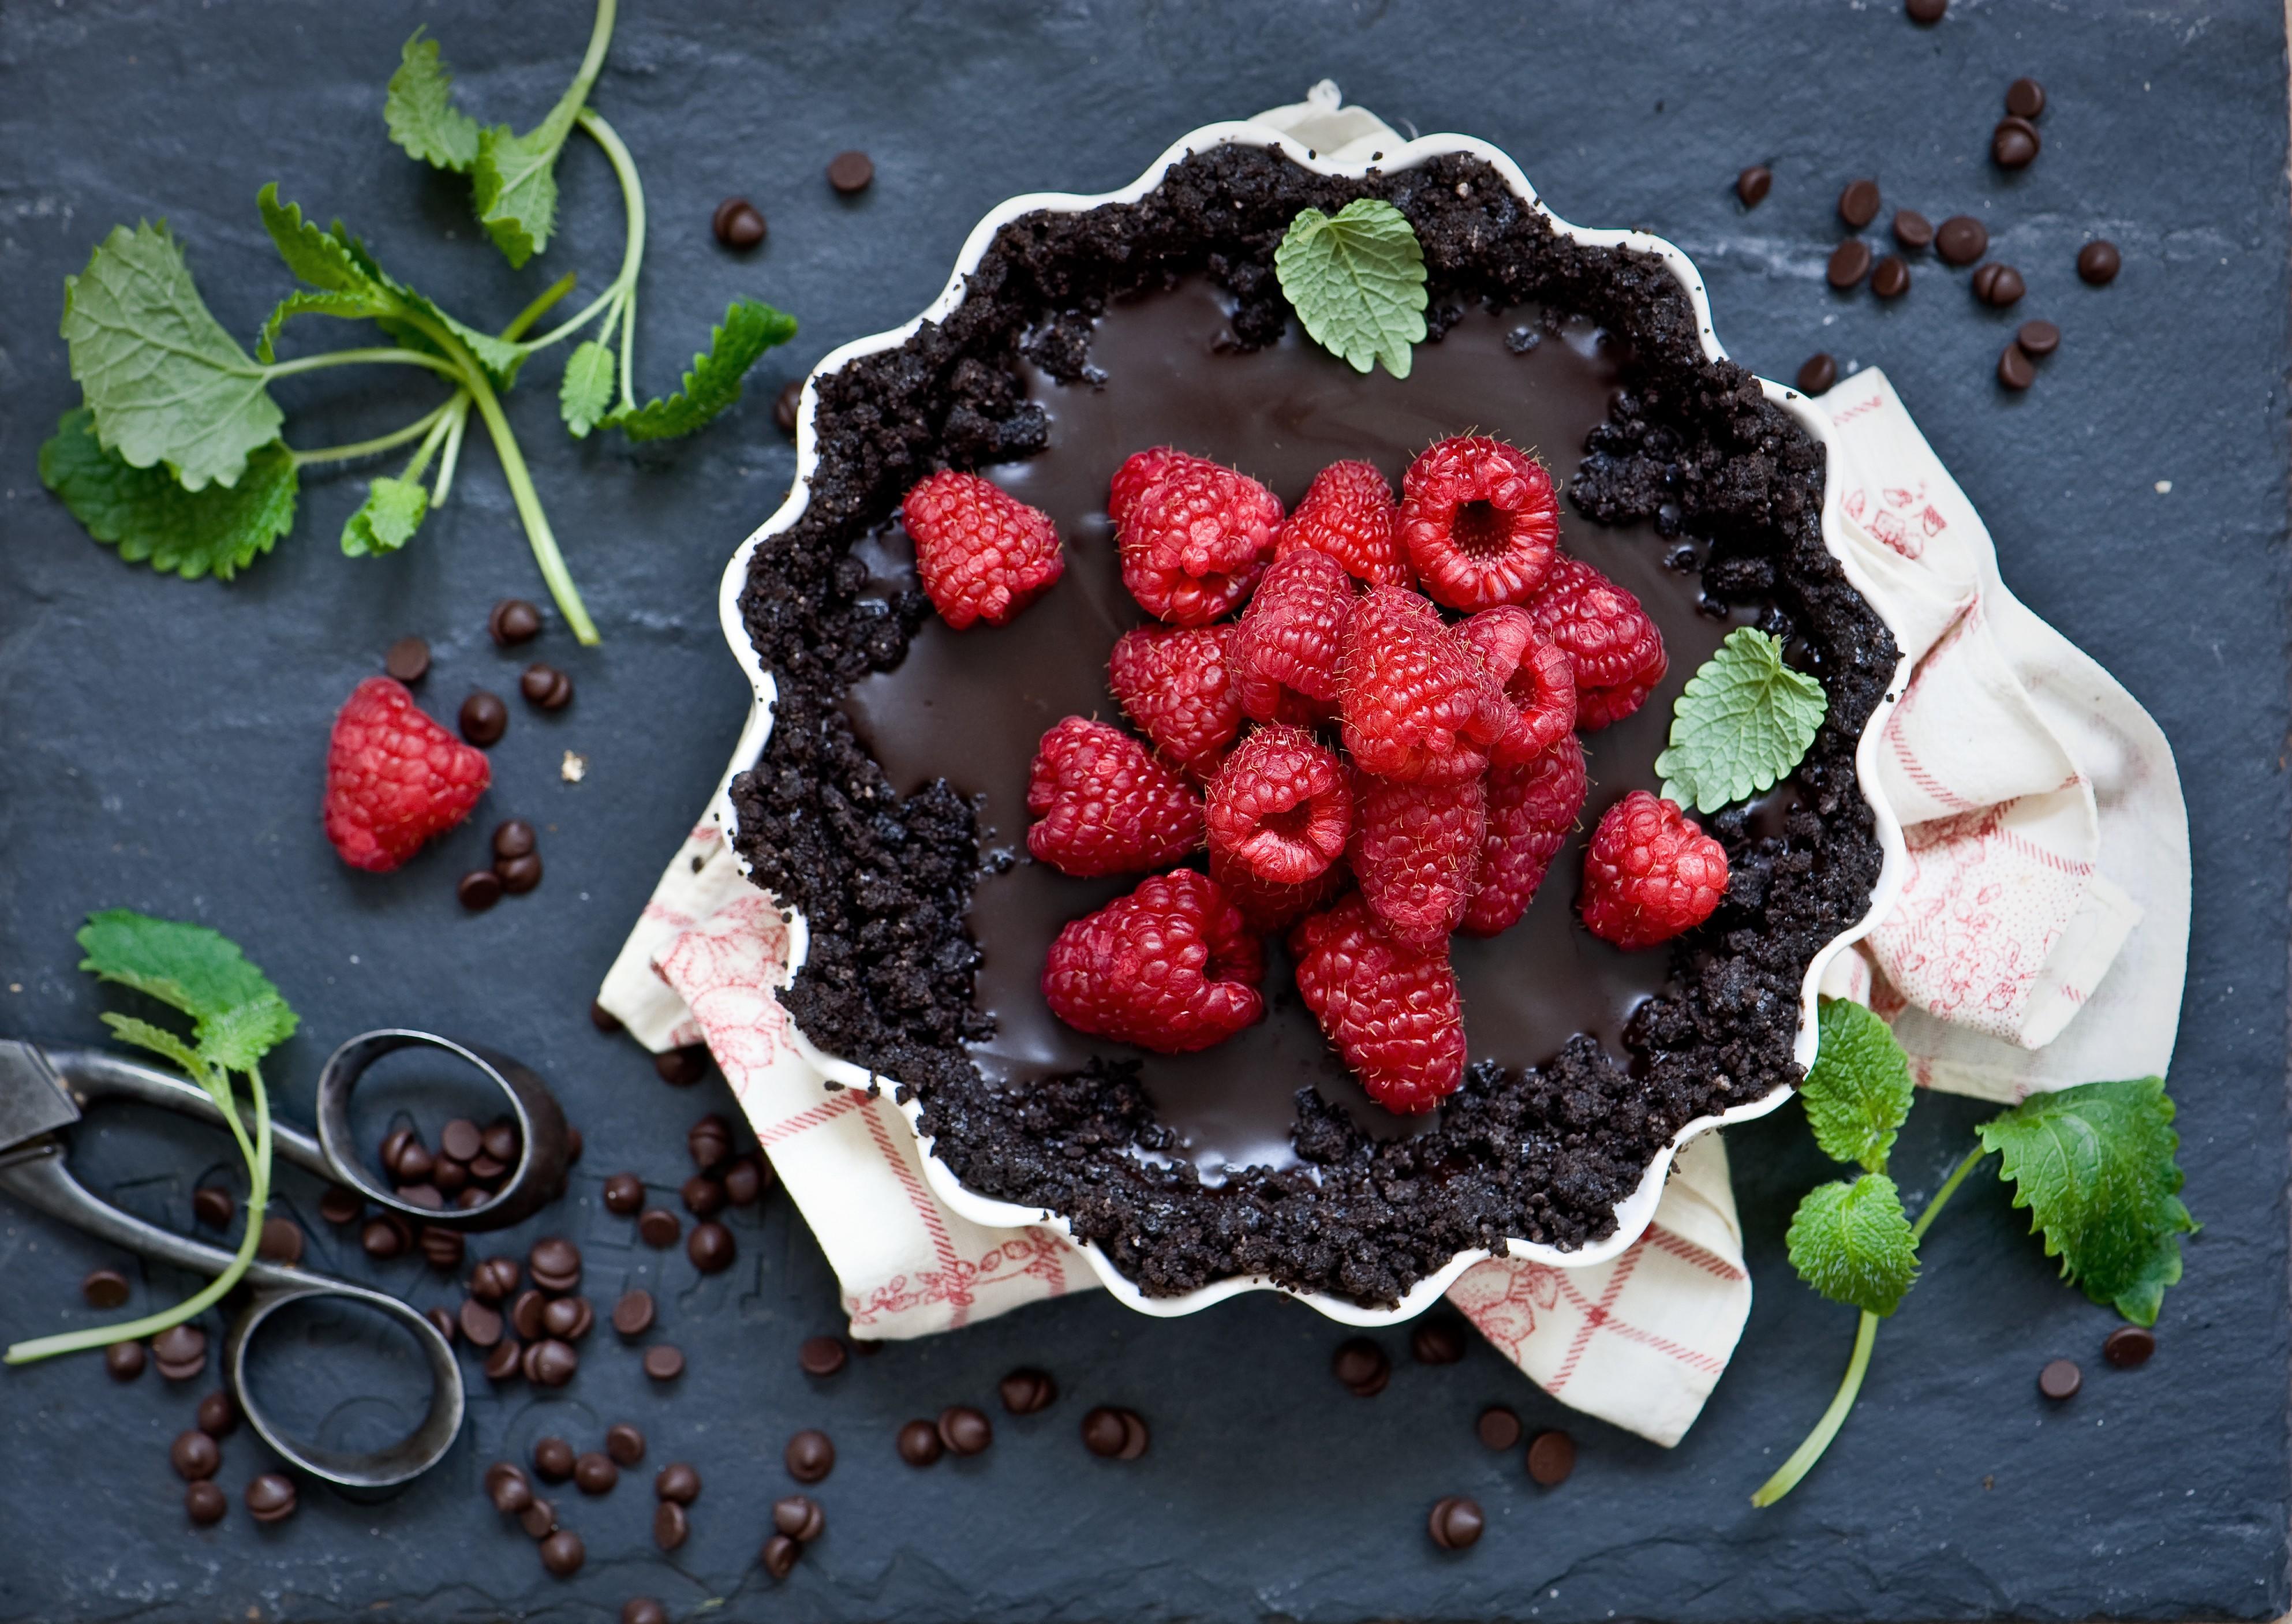 обои сладкое, десерт, пирог, шоколад картинки фото